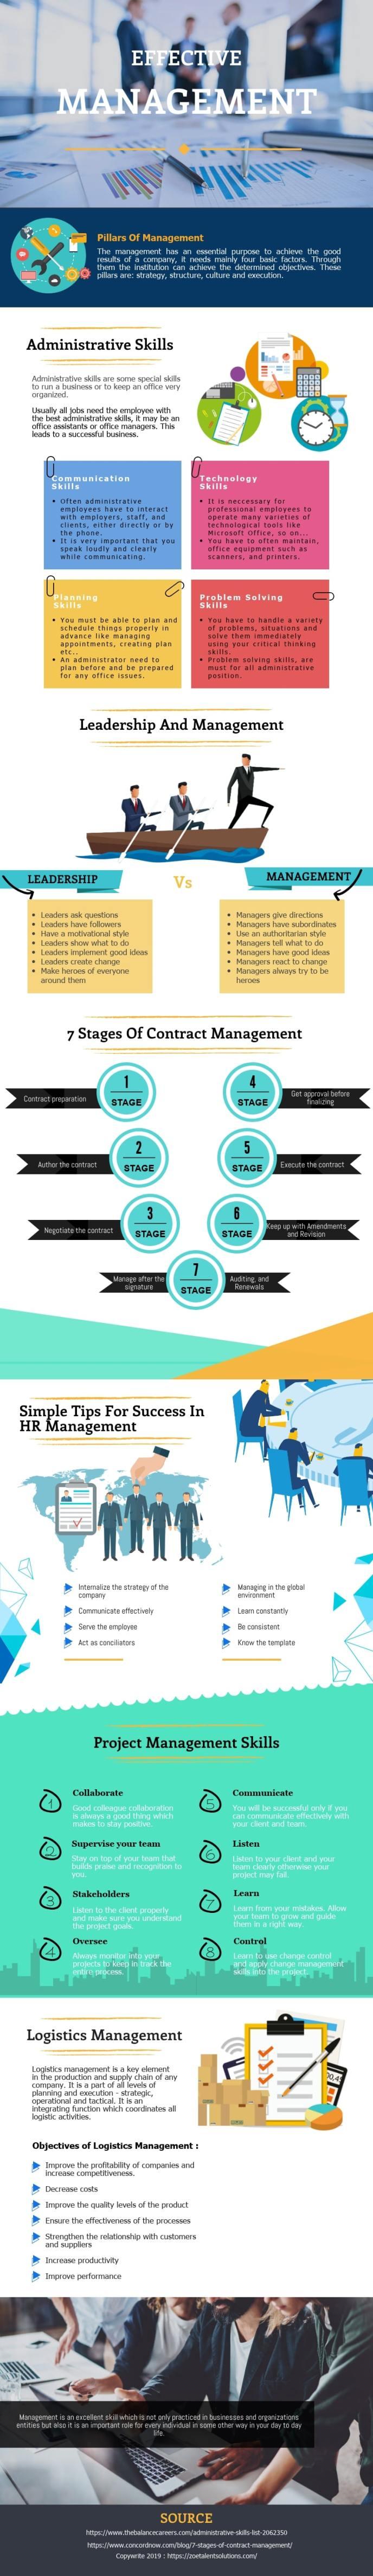 Effective Management.jpg